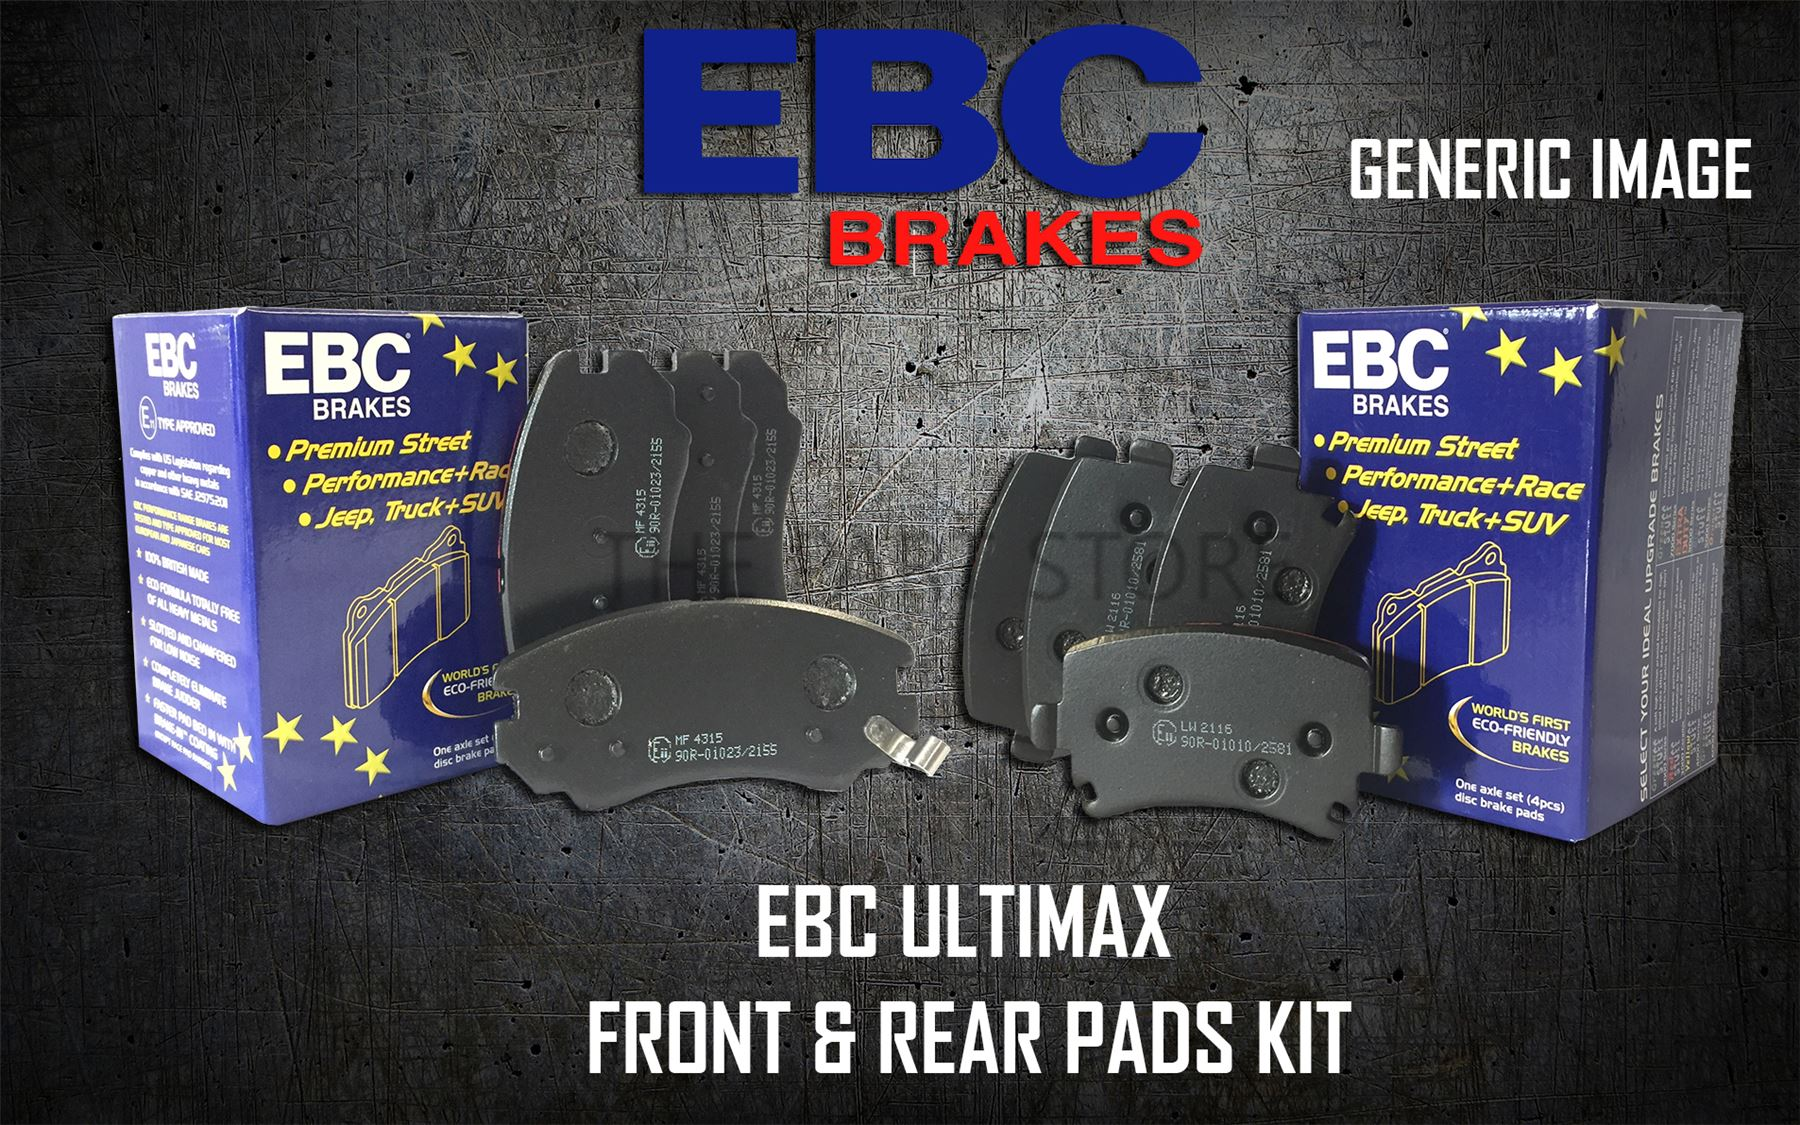 REAR BRAKE PADS KIT SET BRAKING PADS OE QUALITY PADKIT863 EBC ULTIMAX FRONT